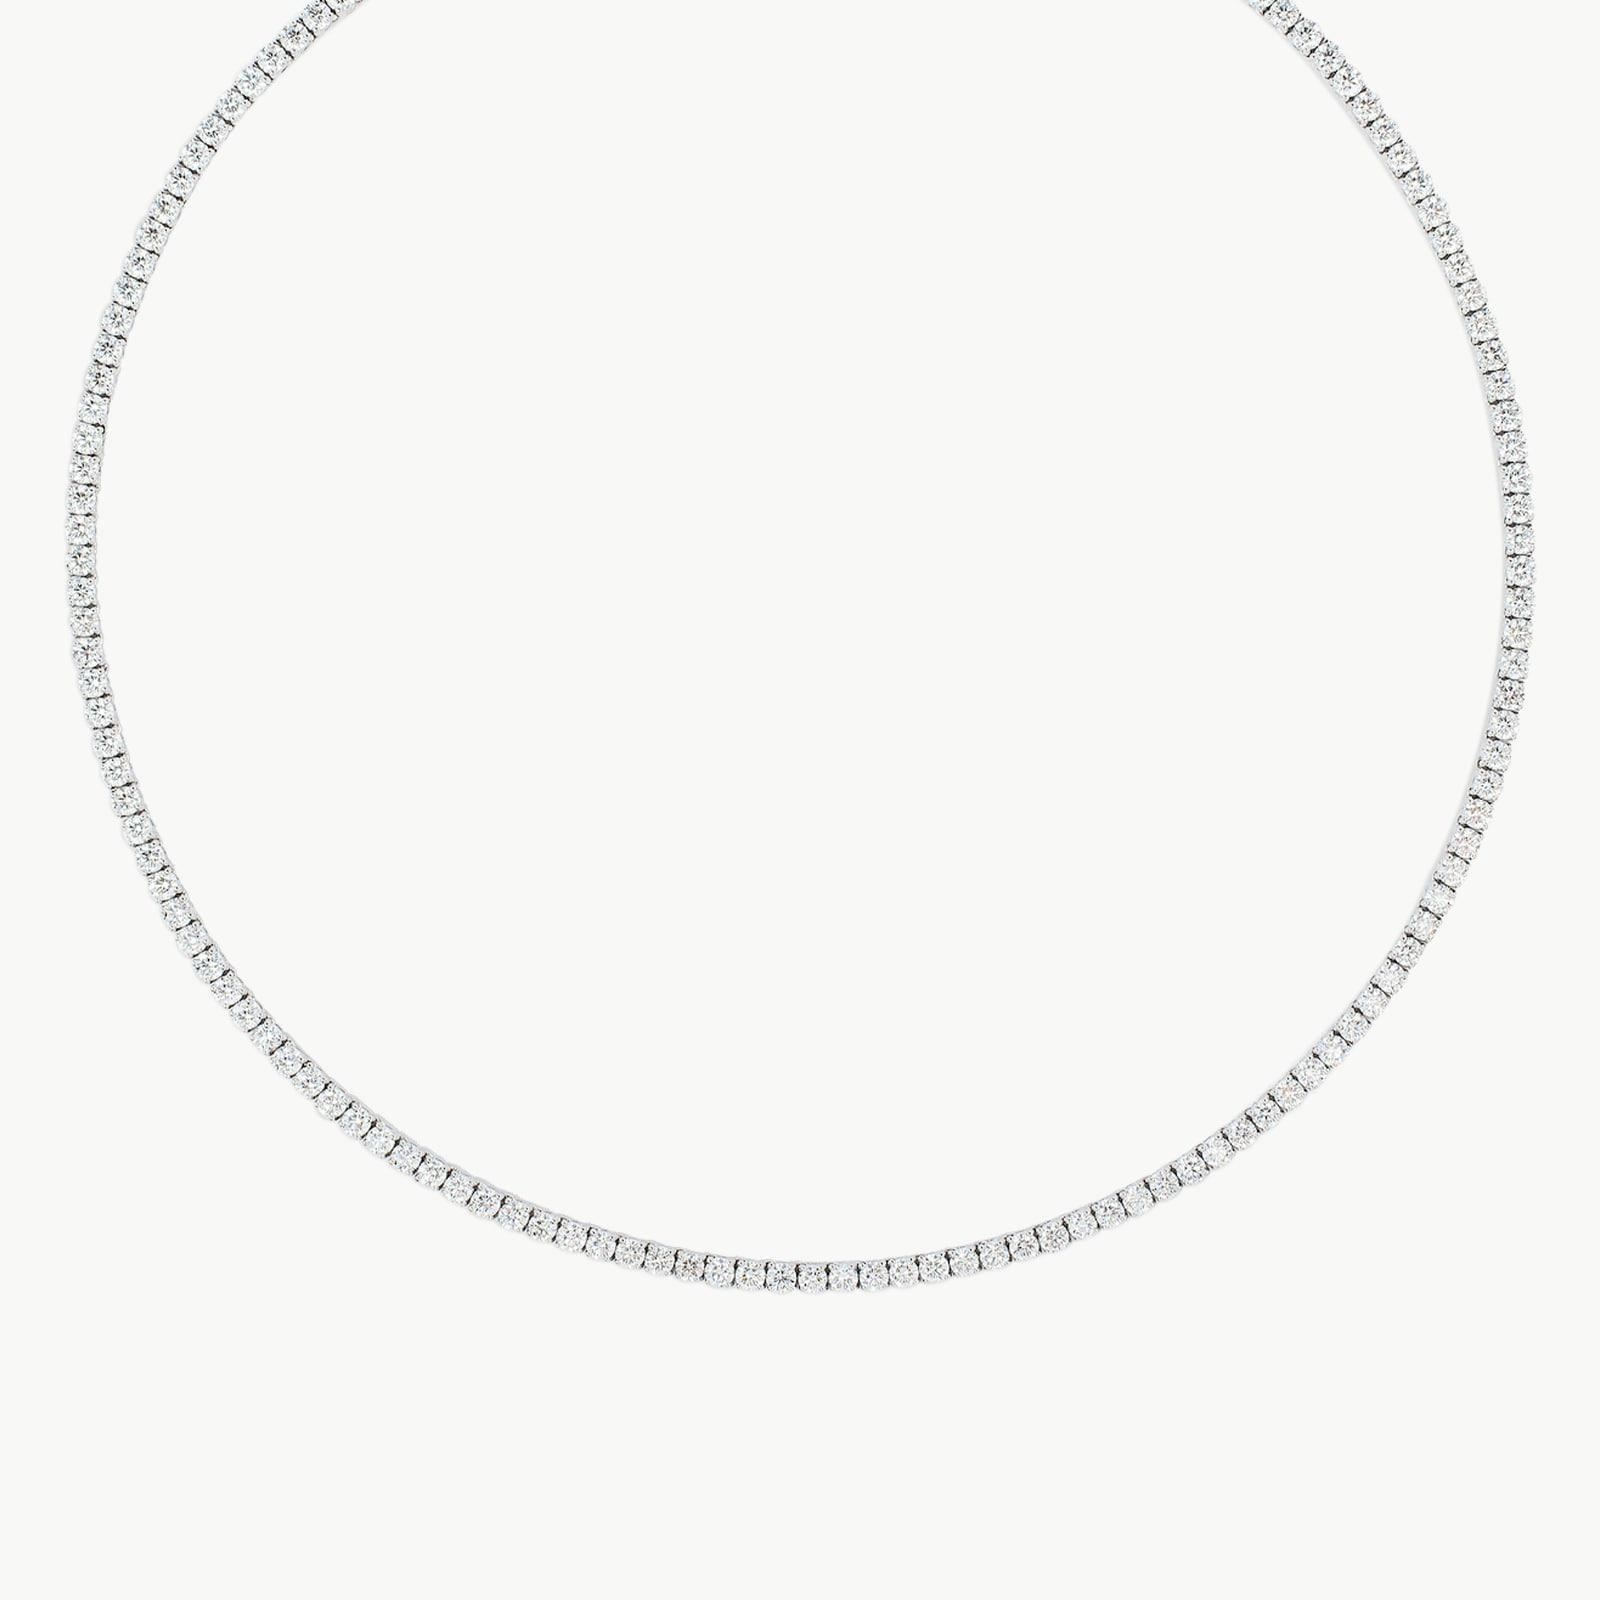 18k White Gold 11.70cttw Diamond Necklace